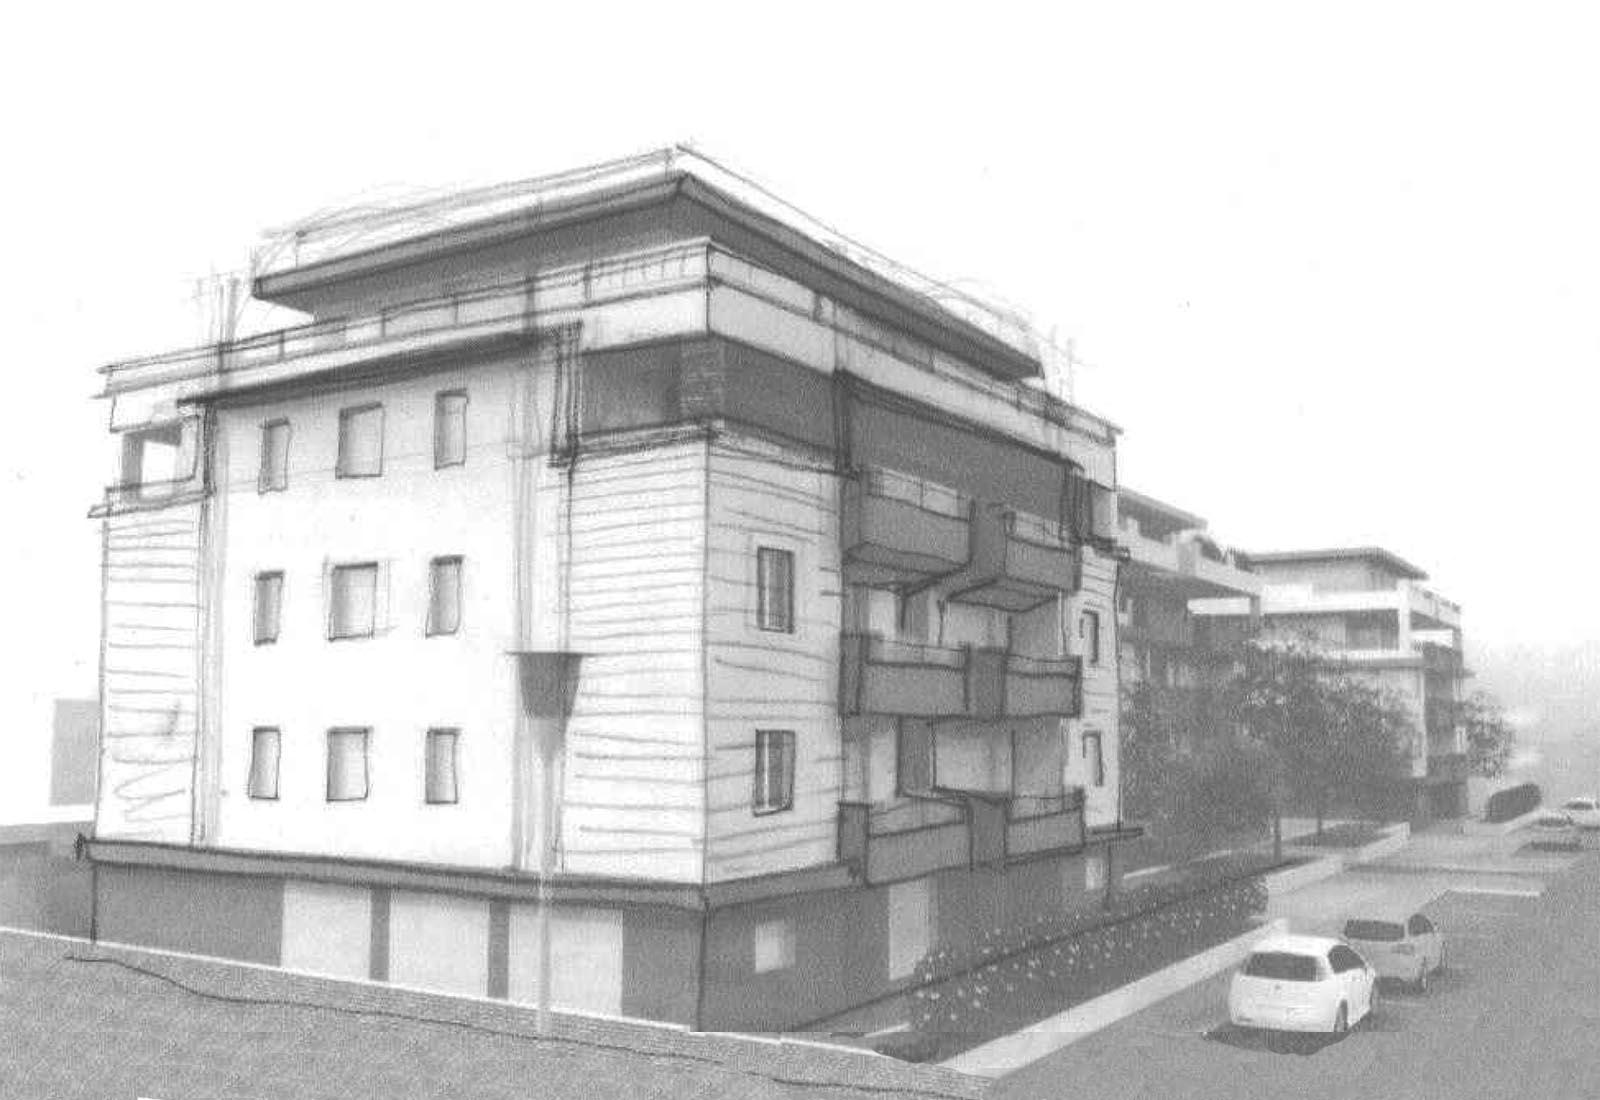 Residenze via Biringhello a Rho - Schizzo compositivo